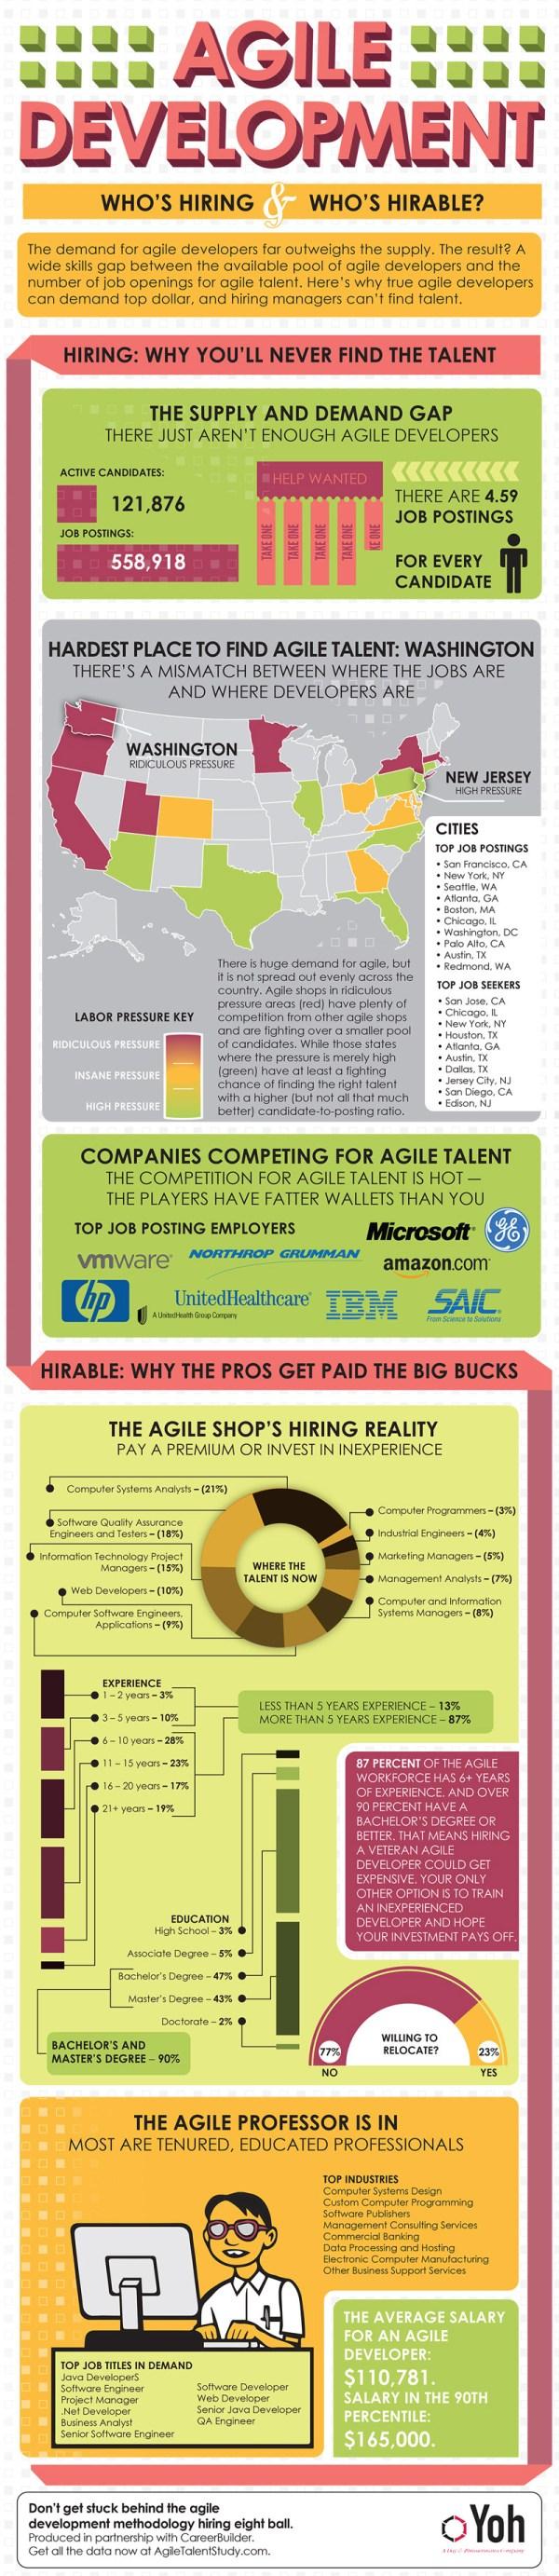 jobs-agile-developers-infographic